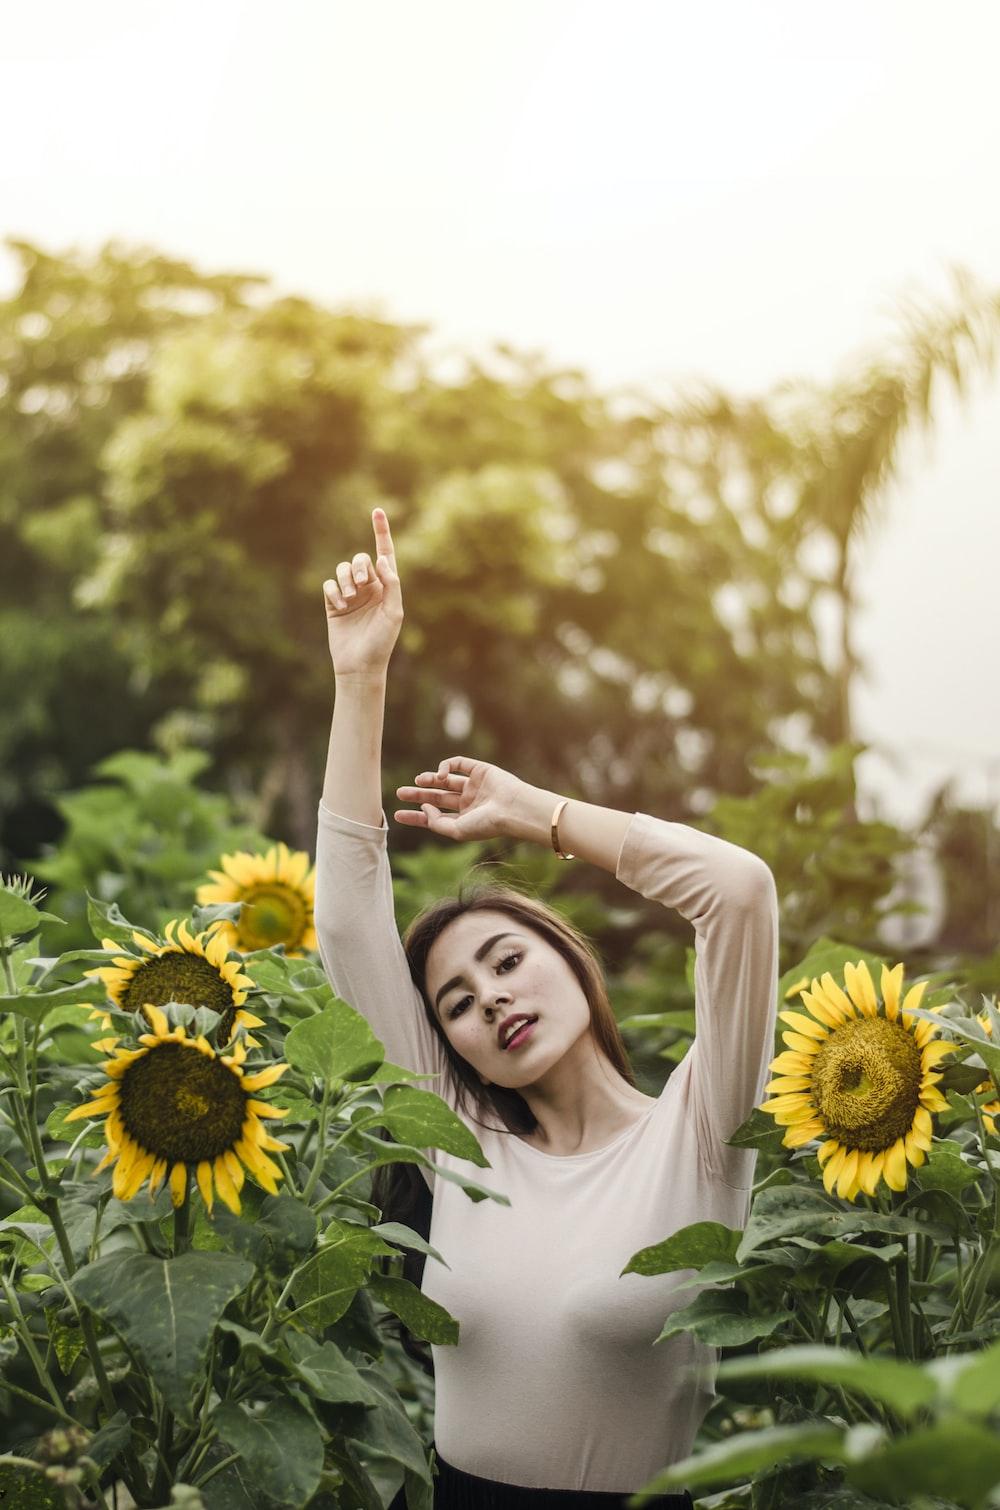 woman raising her hand surround by sunflowers during daytime